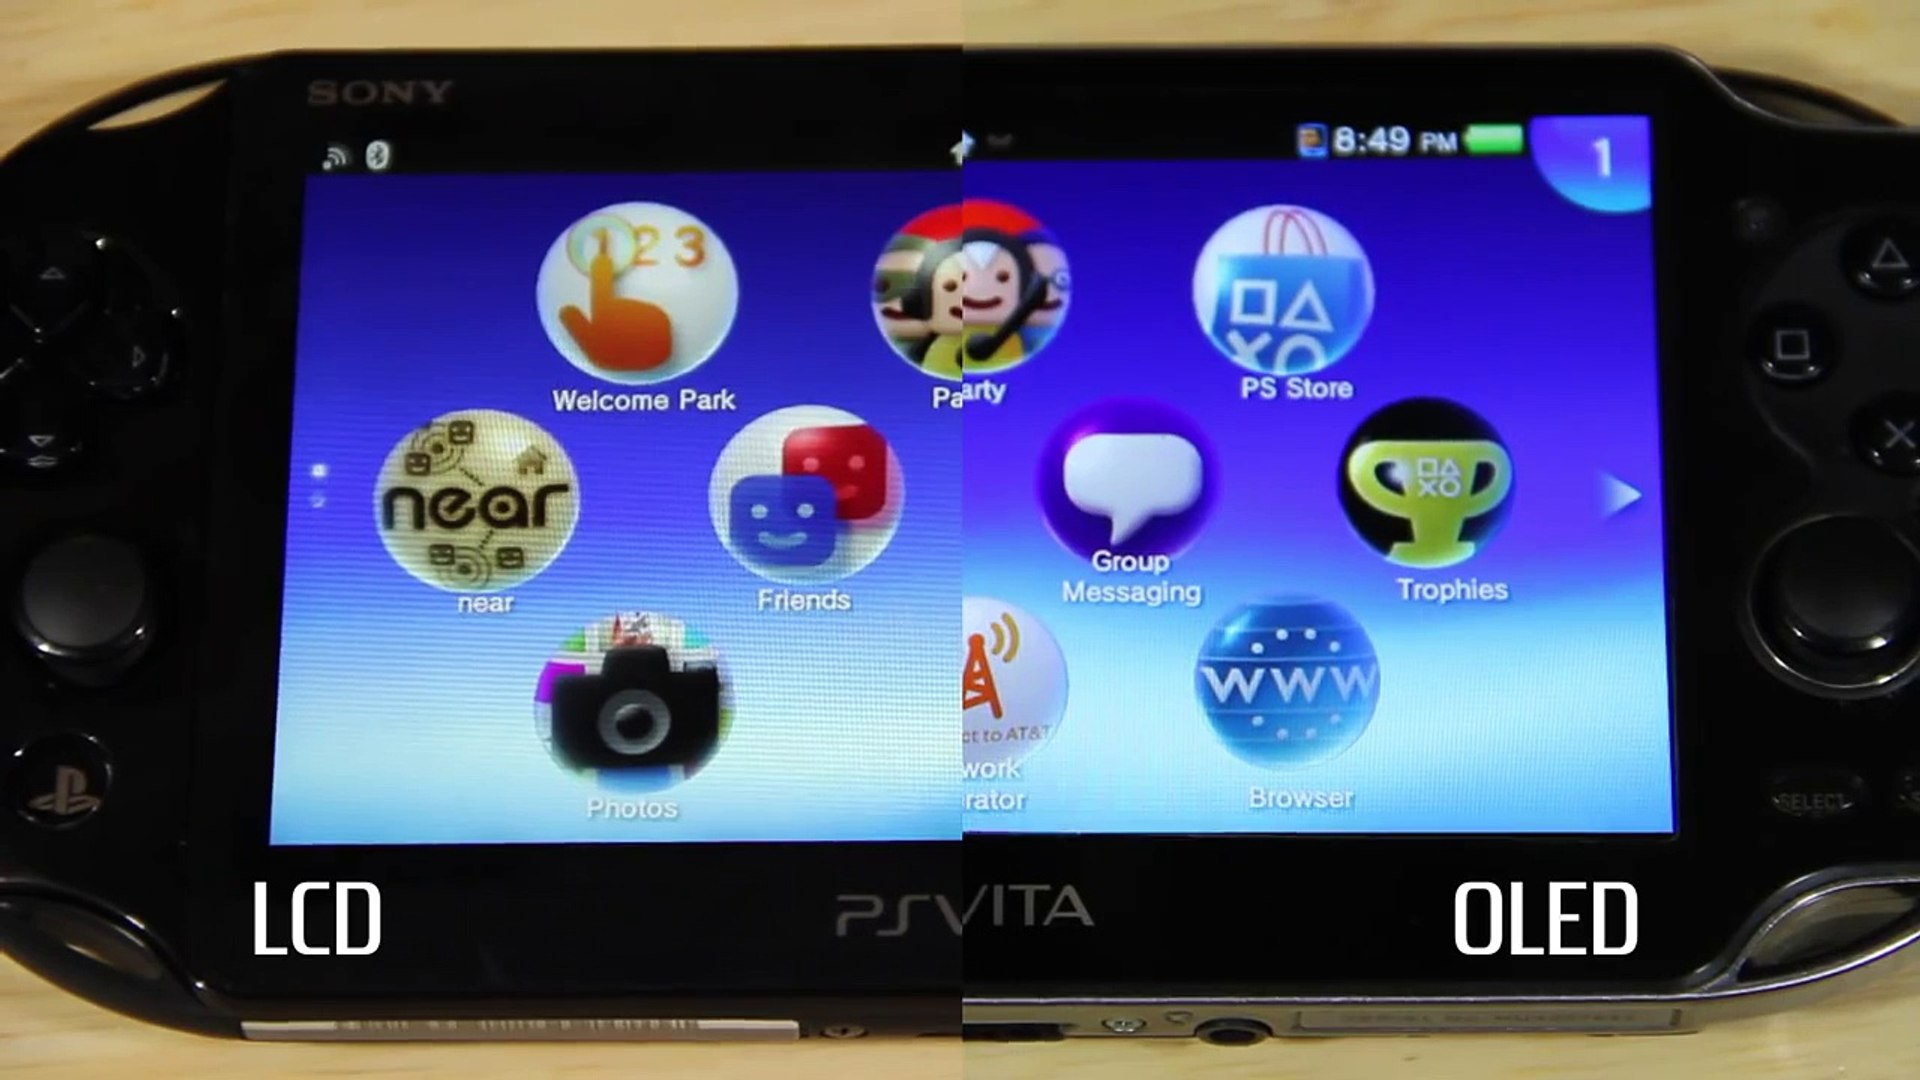 Ps Vita Screen Comparison Pch 2000 Lcd Vs Oled Vita Video Dailymotion